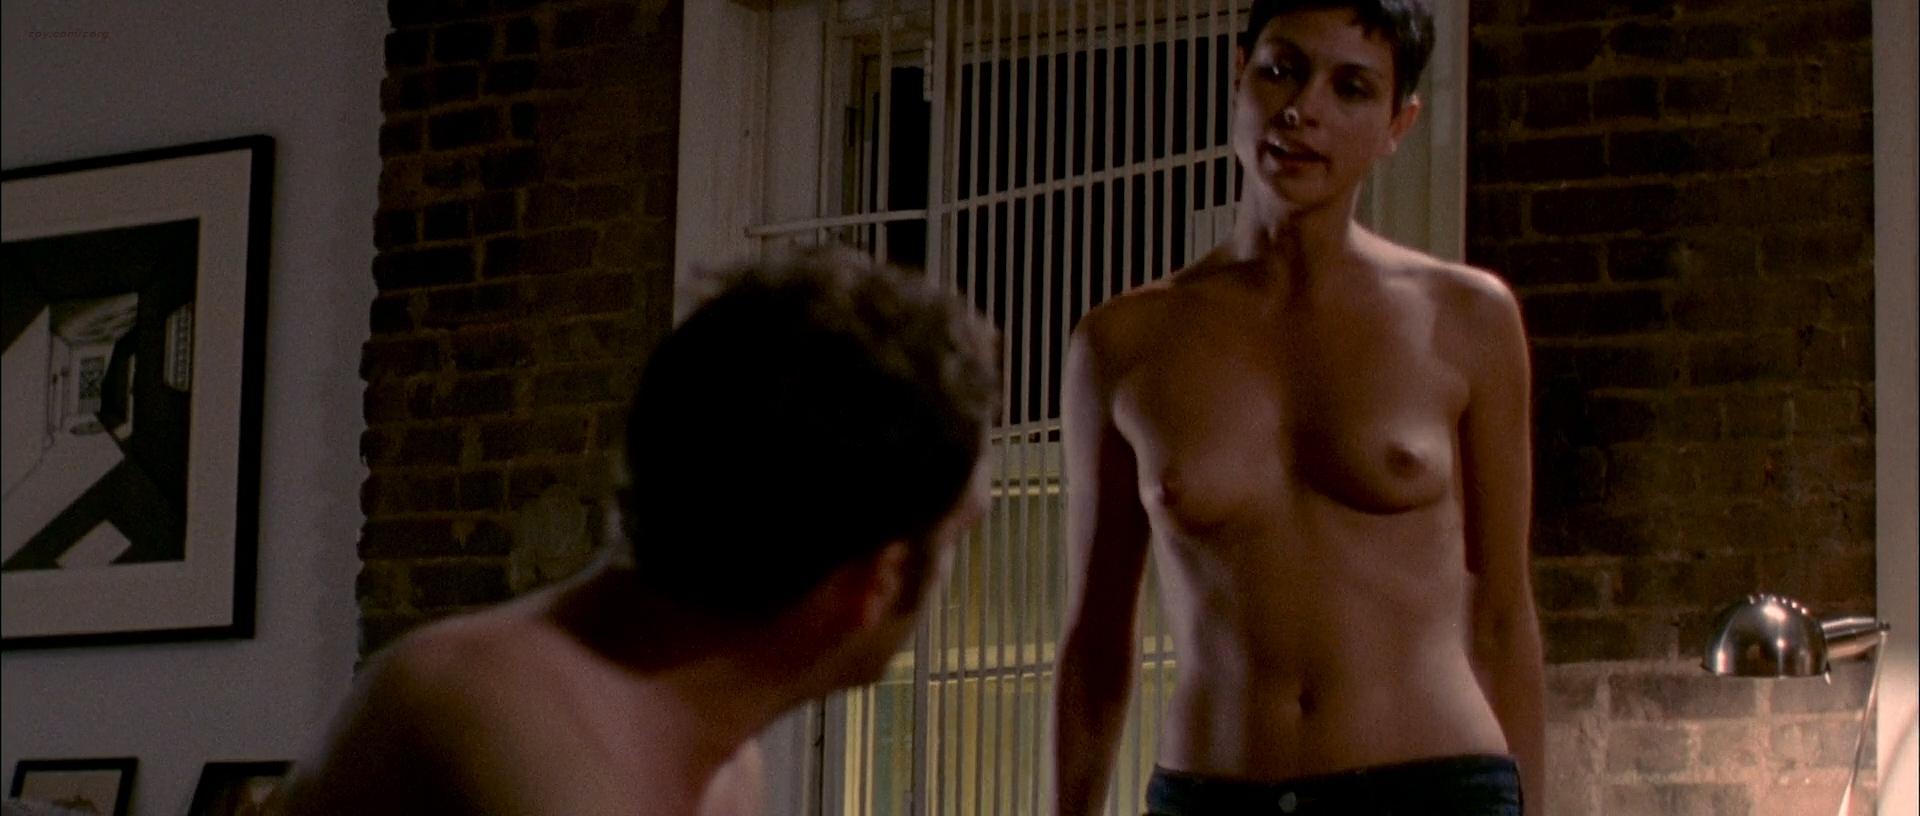 Morena Baccarin nude topless, Vanessa Kai nude sex - Death in Love (2008) hd 1080p Bluray (7)